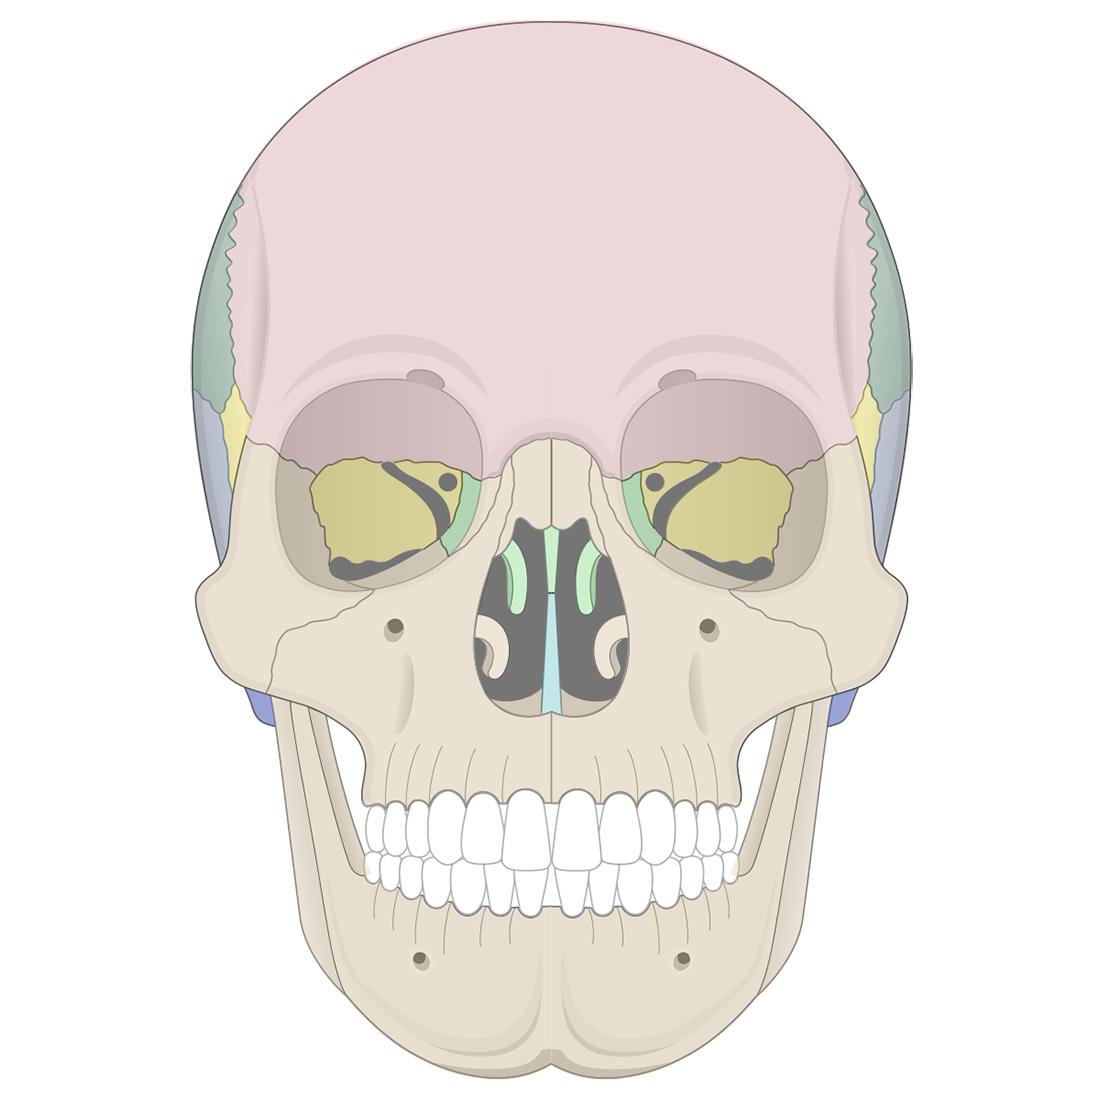 Cranial bones: anterior view of the skull